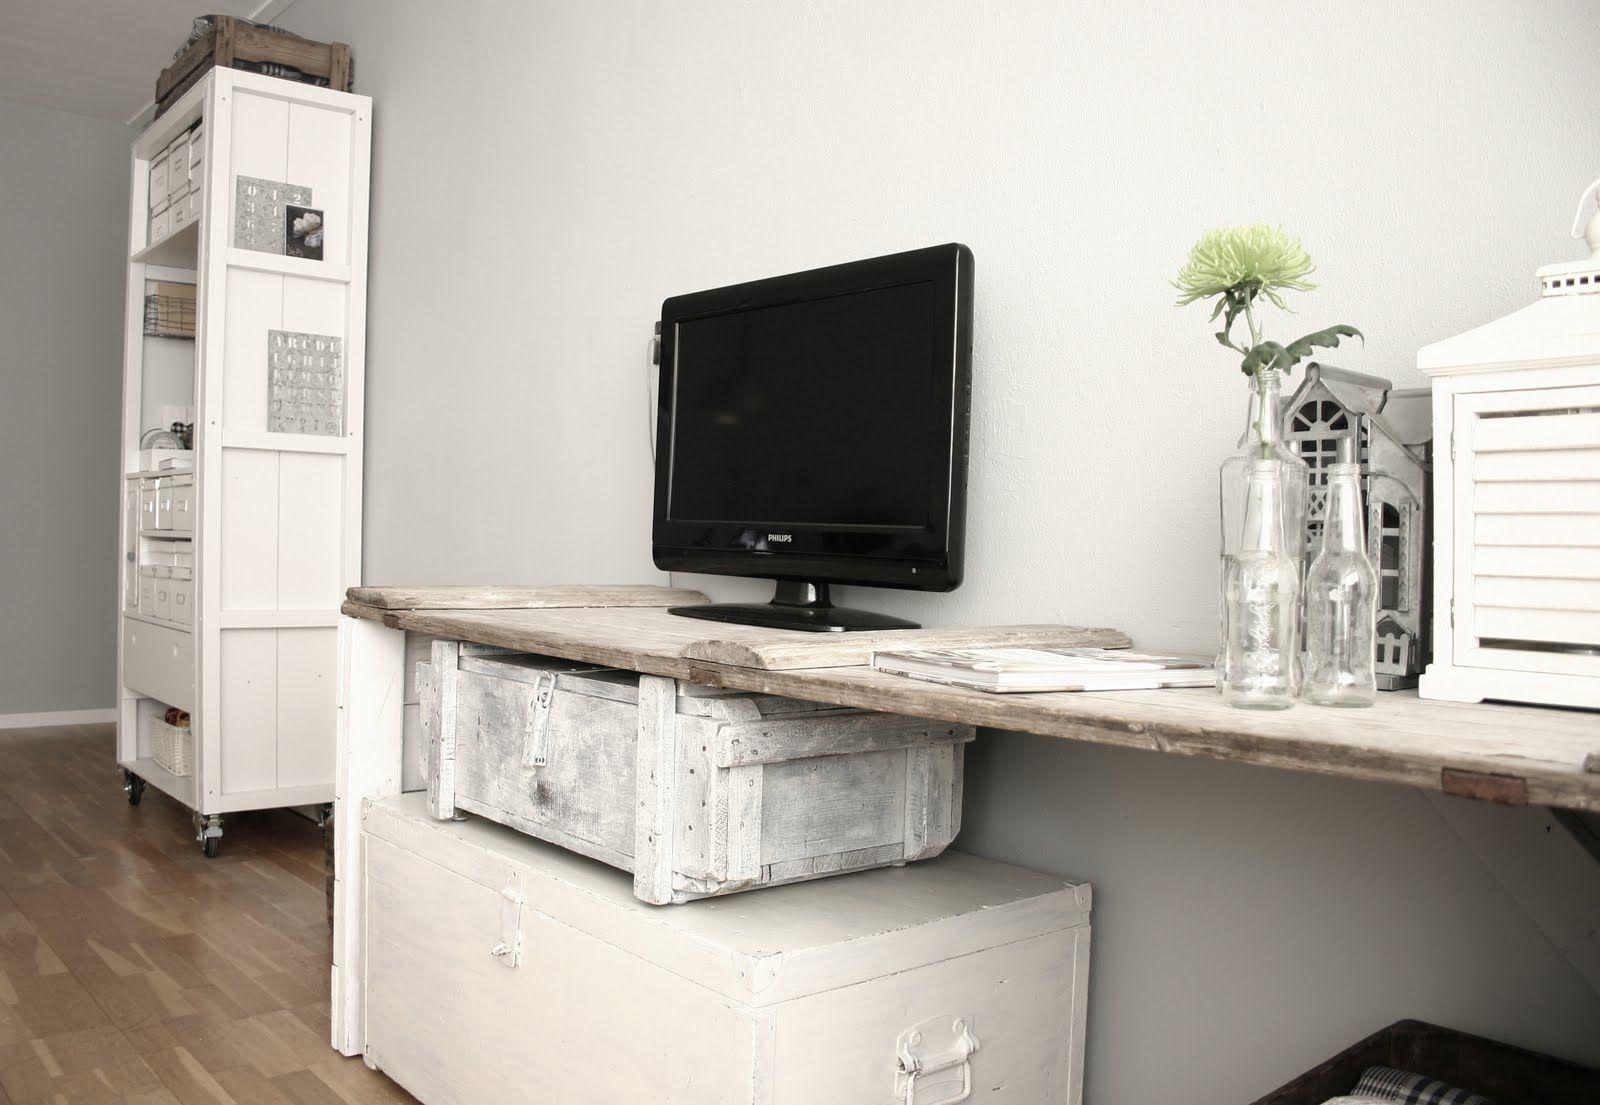 Wandplank Als Bureau.Ruwe Plank Als Bureau Lifestyle Landelijk Buitenleven